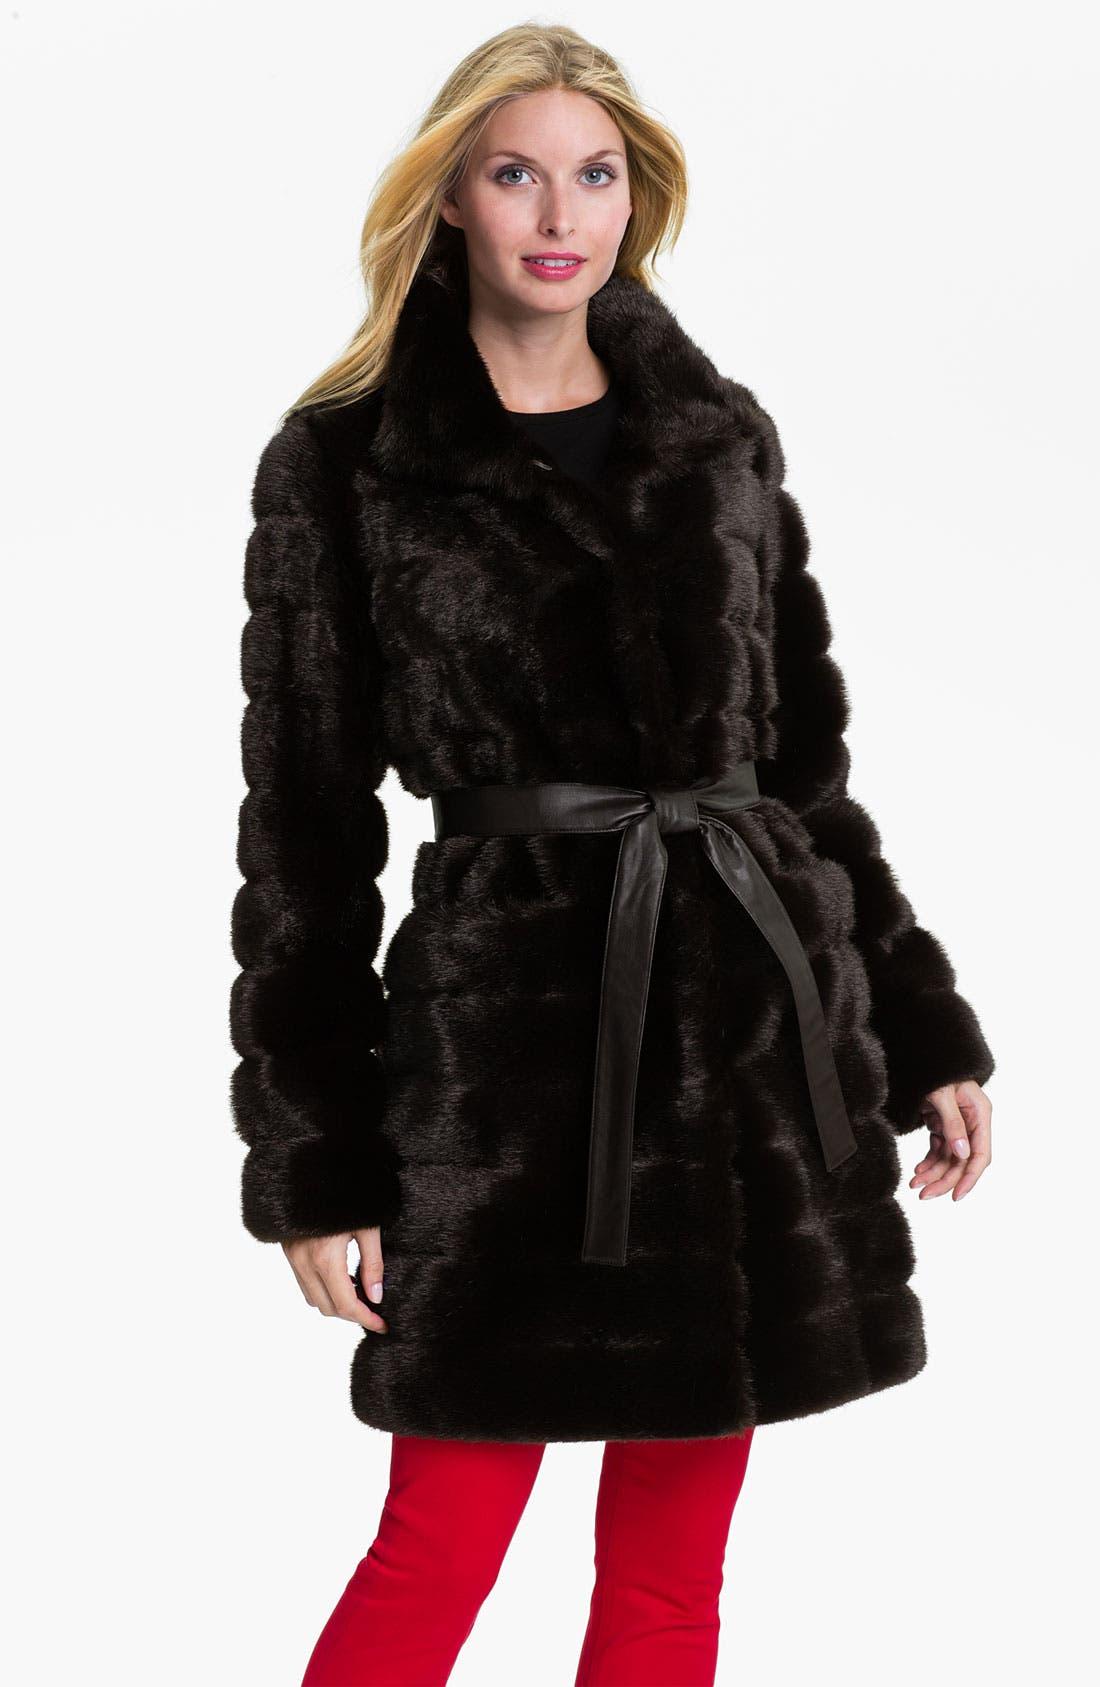 Alternate Image 1 Selected - Kristen Blake Belted Faux Fur Coat (Online Exclusive)